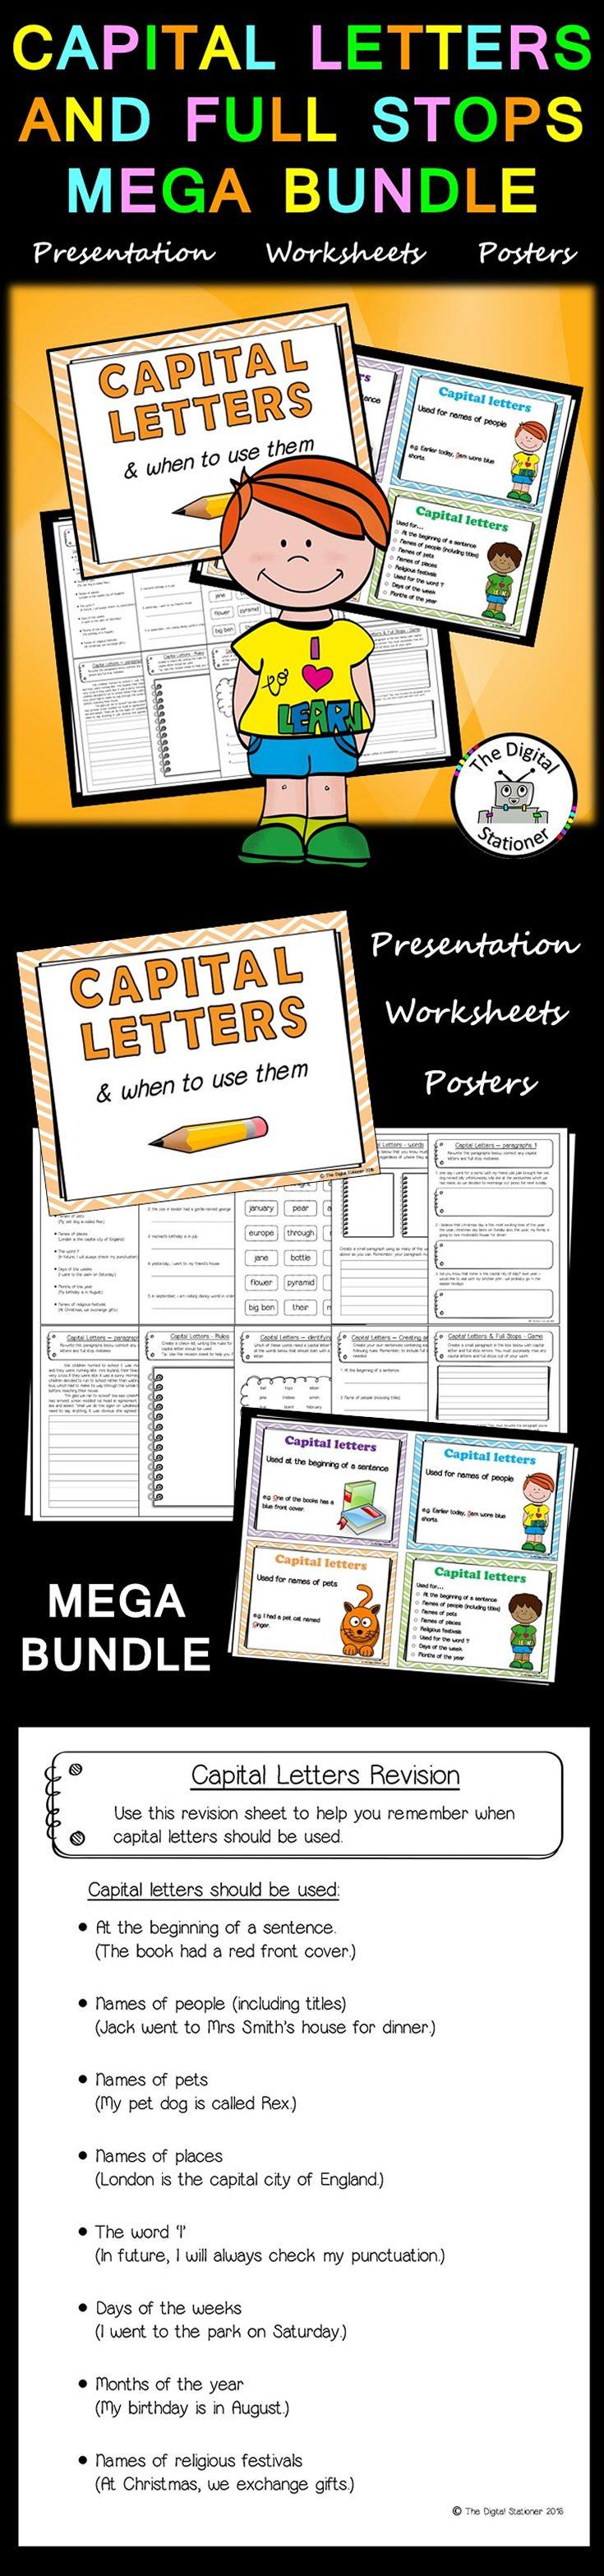 $3.50  - Capital Letters & Full stops MEGA BUNDLE word classes worksheets, posters, Presentation, PowerPoint/displays / printables. Literacy